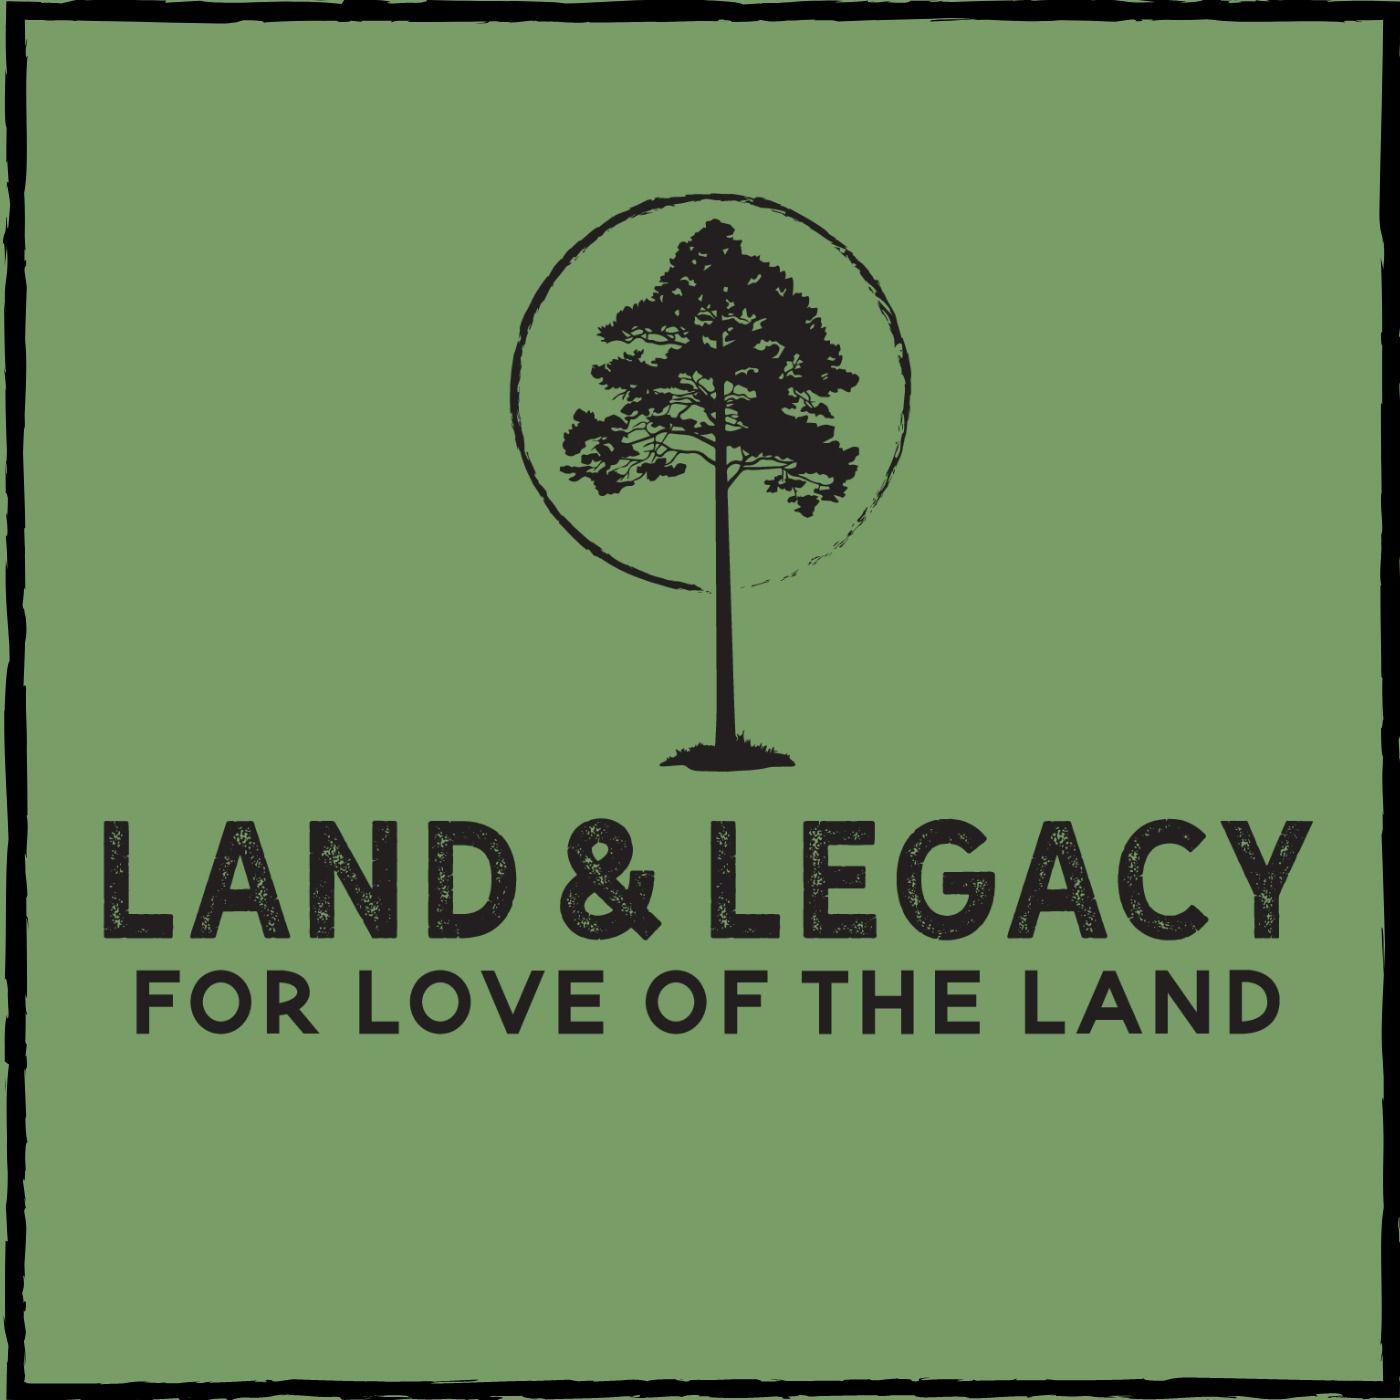 Land & Legacy - Expanding Travel Corridors and Increasing Diversity